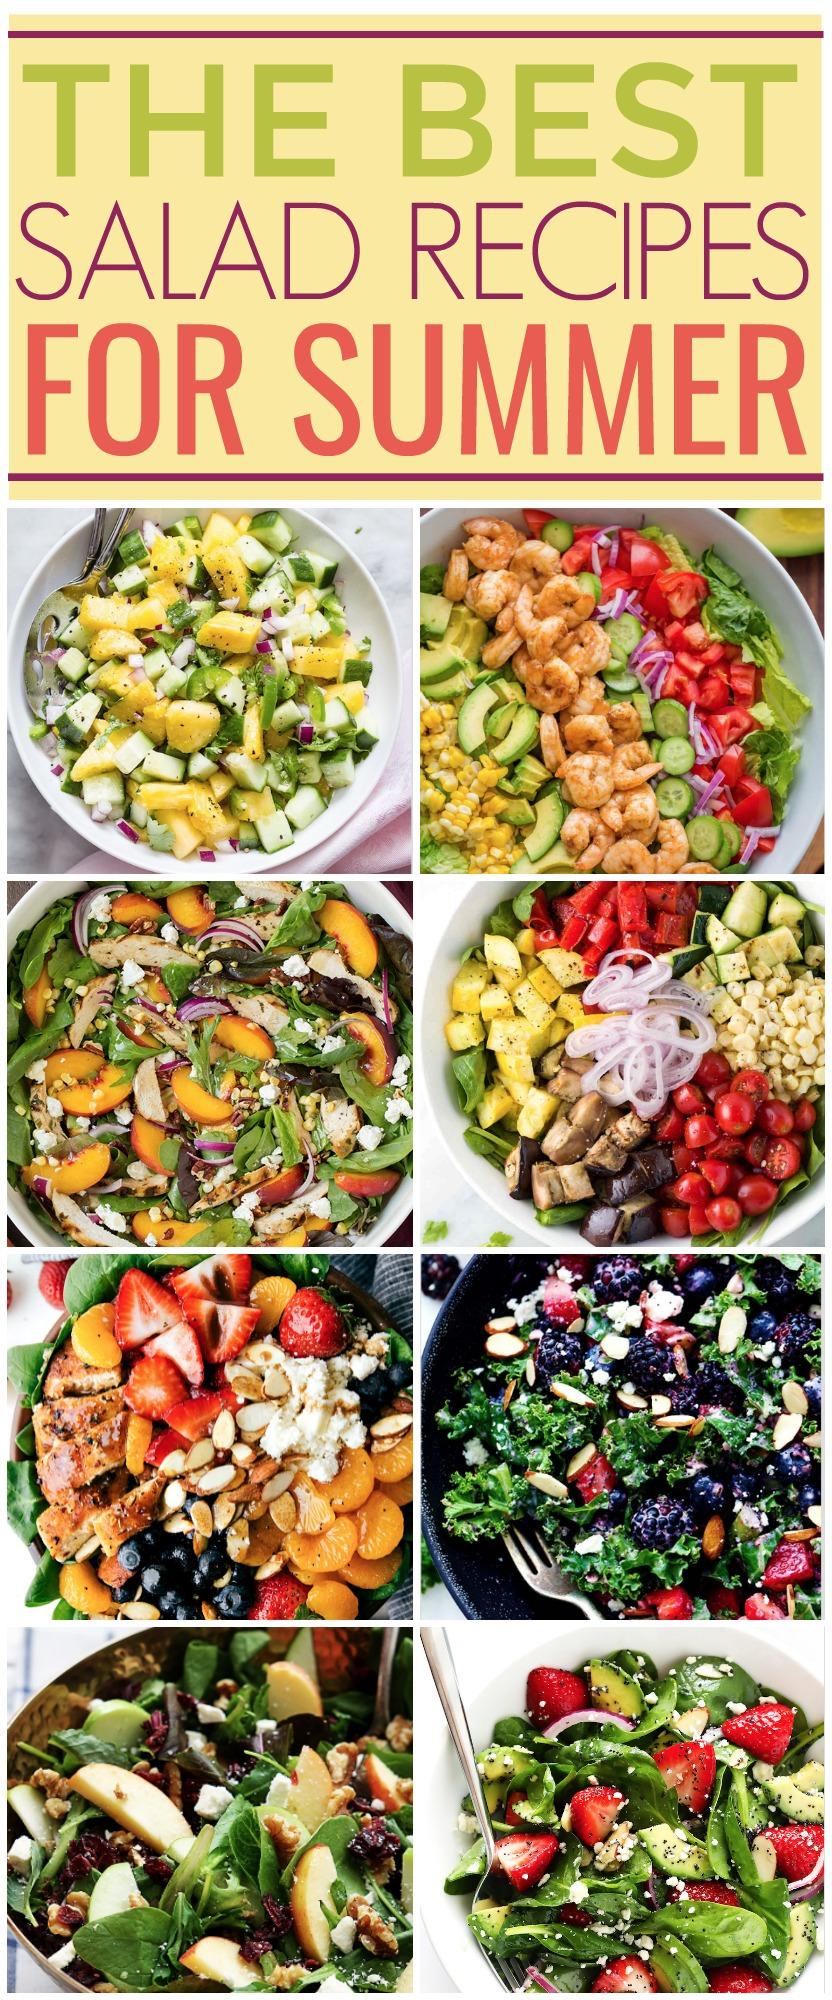 summer salad recipes, creative salad ideas